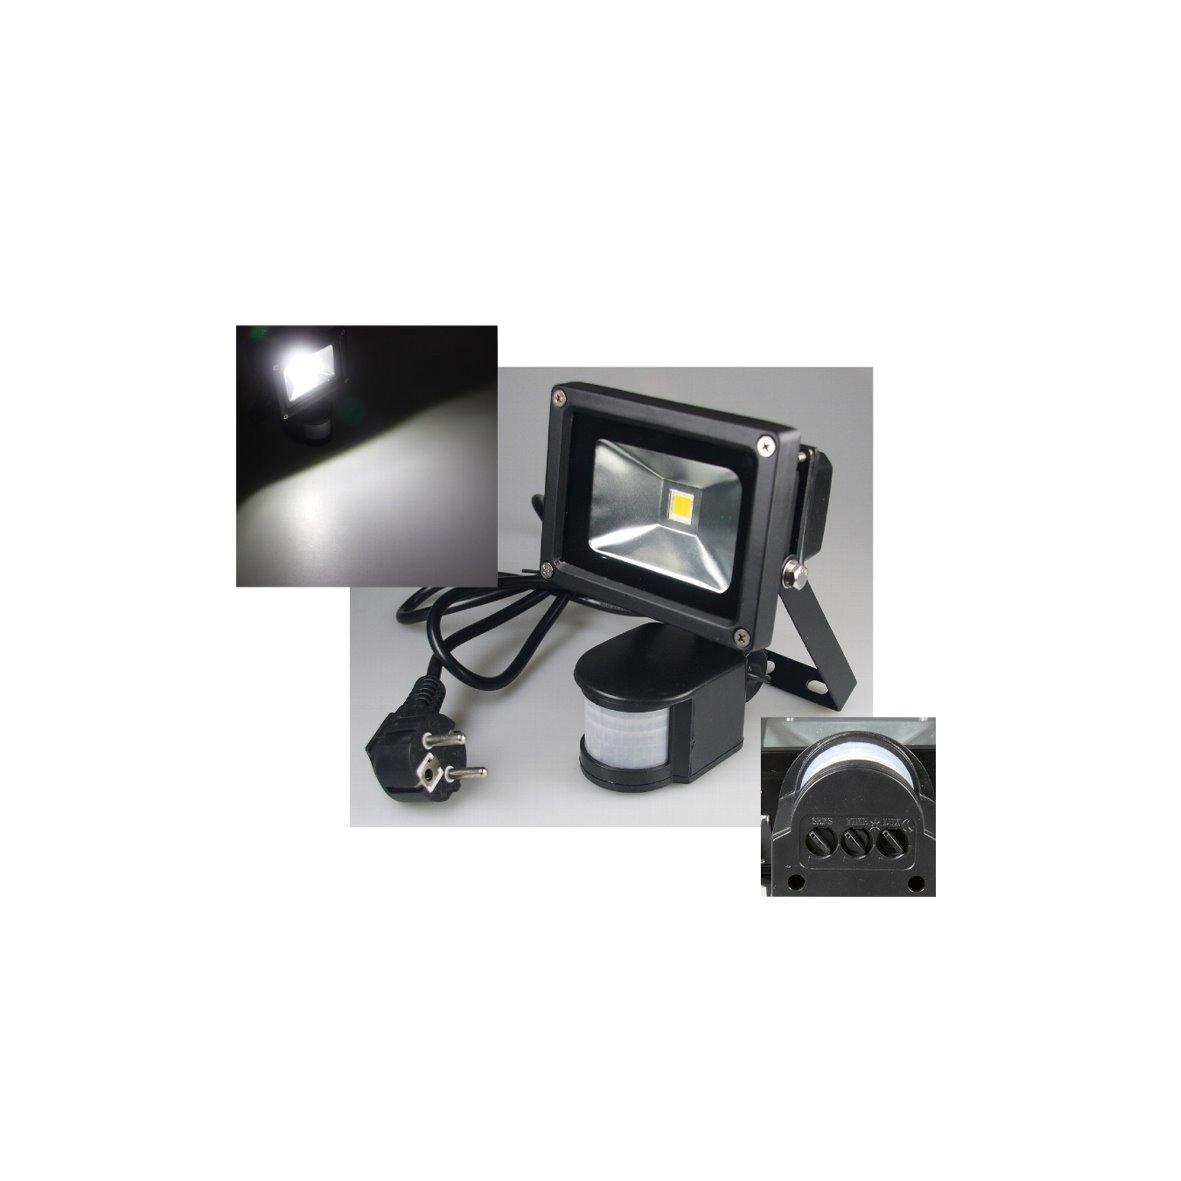 led cob aussenstrahler strahler fluter flutlicht baustrahler feuchtraum aussen ebay. Black Bedroom Furniture Sets. Home Design Ideas